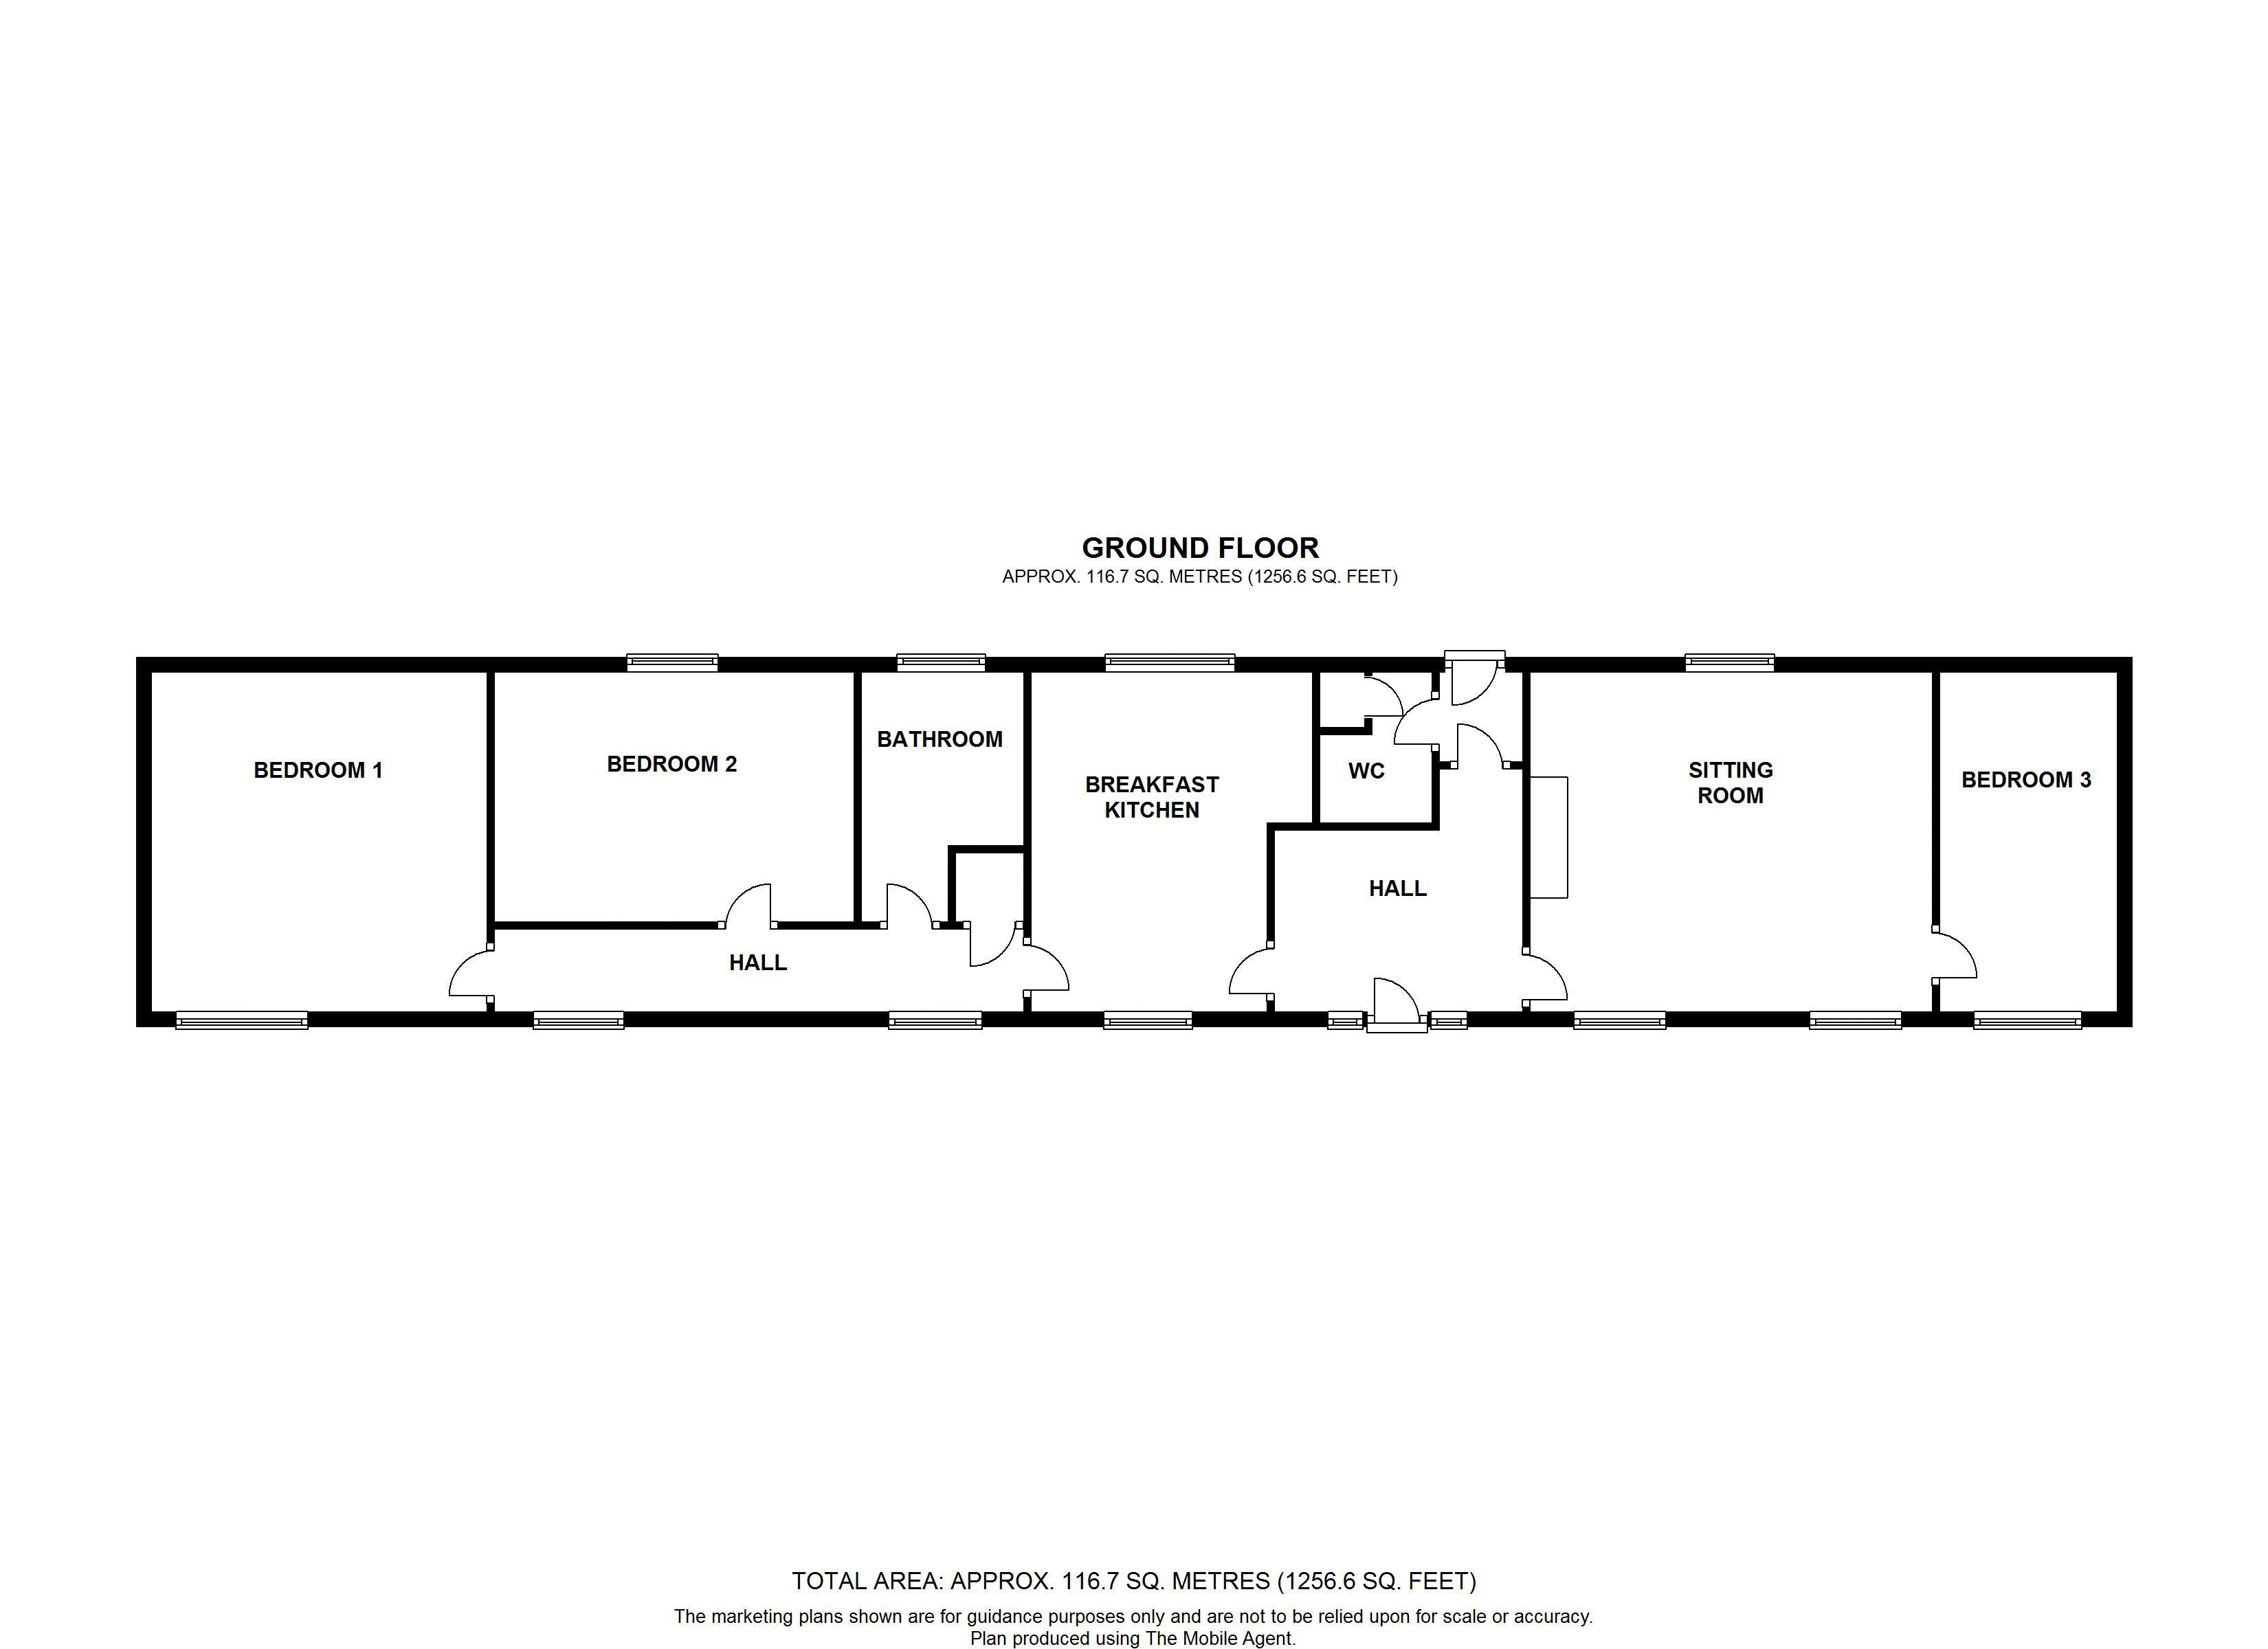 Floorplan: All property